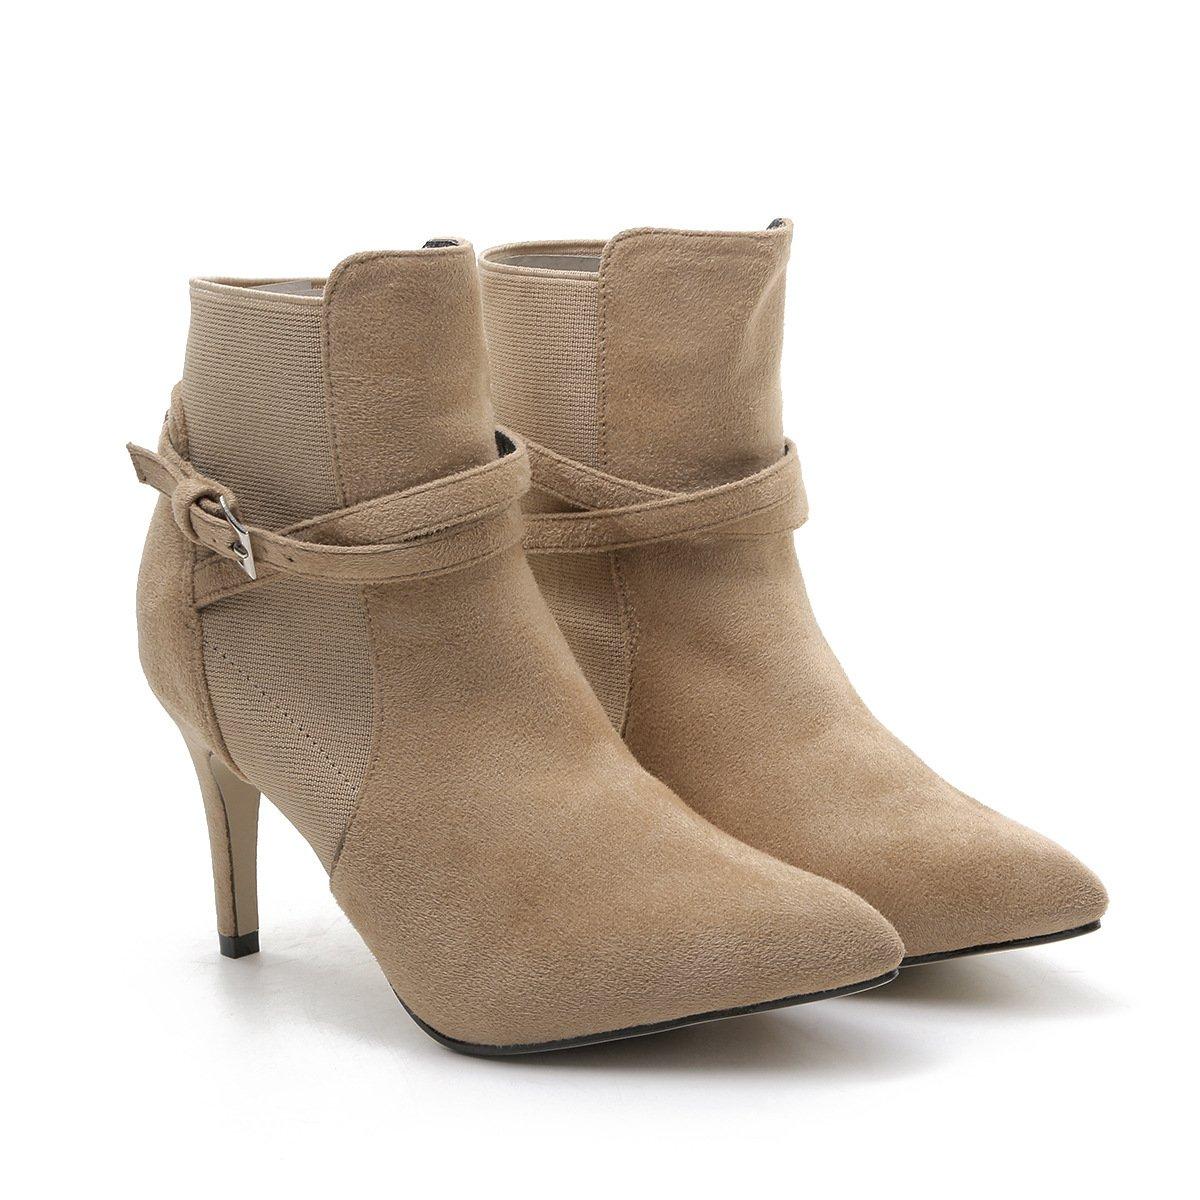 Herren Chelsea Boots Bequem Rundzehen Rutschfest Gummi Sohle